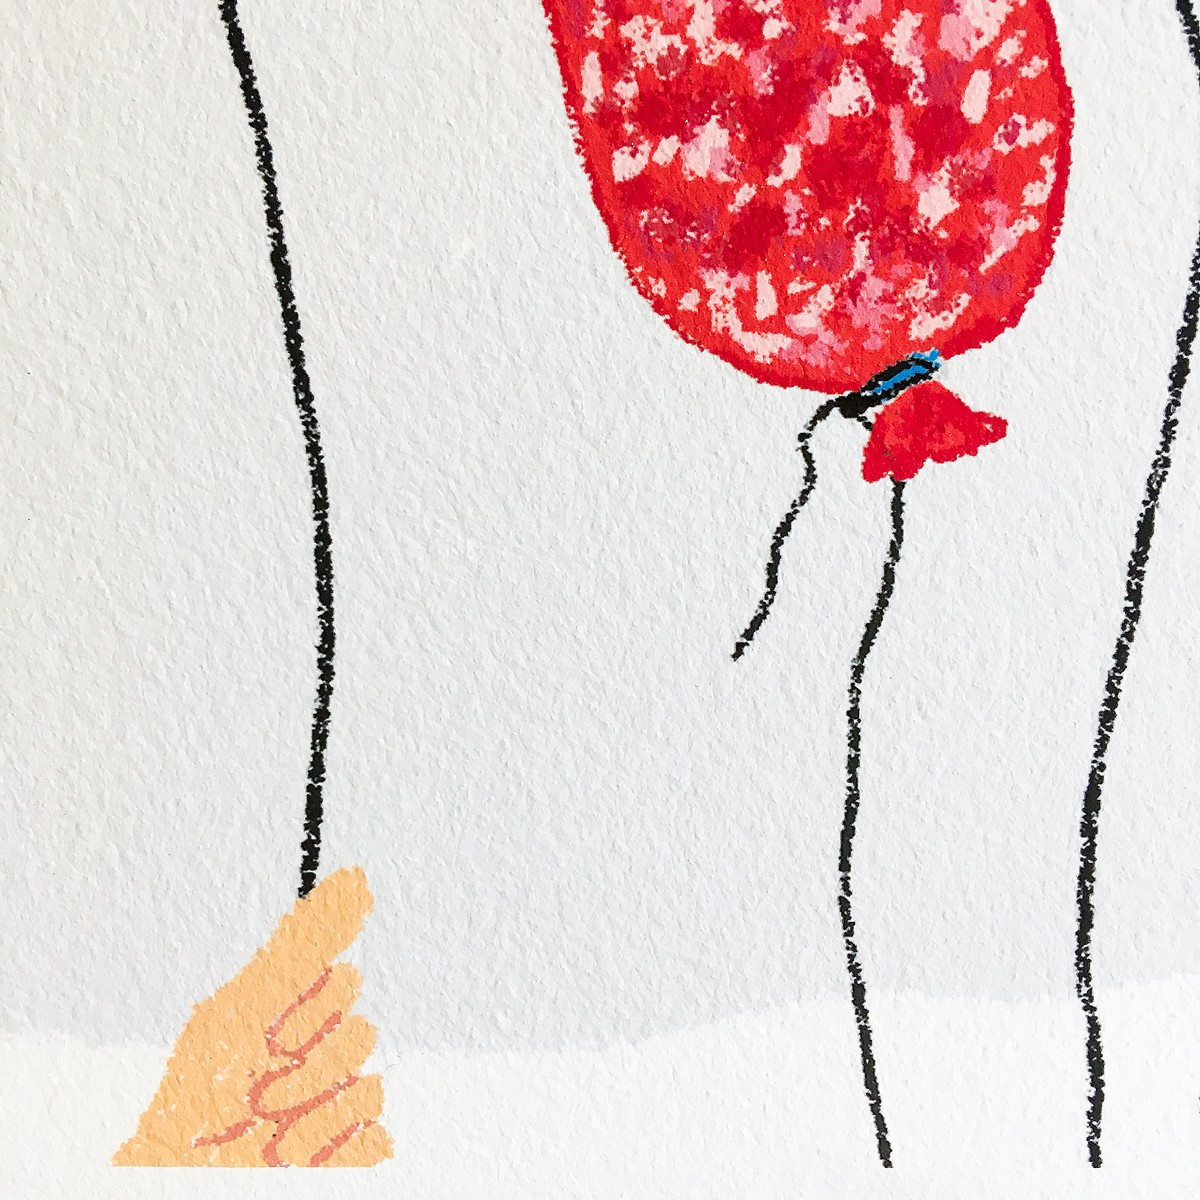 Wurstballon – YUKY RYANG hochwertiger Kunstdruck (Giclée), Format 40 x 40cm